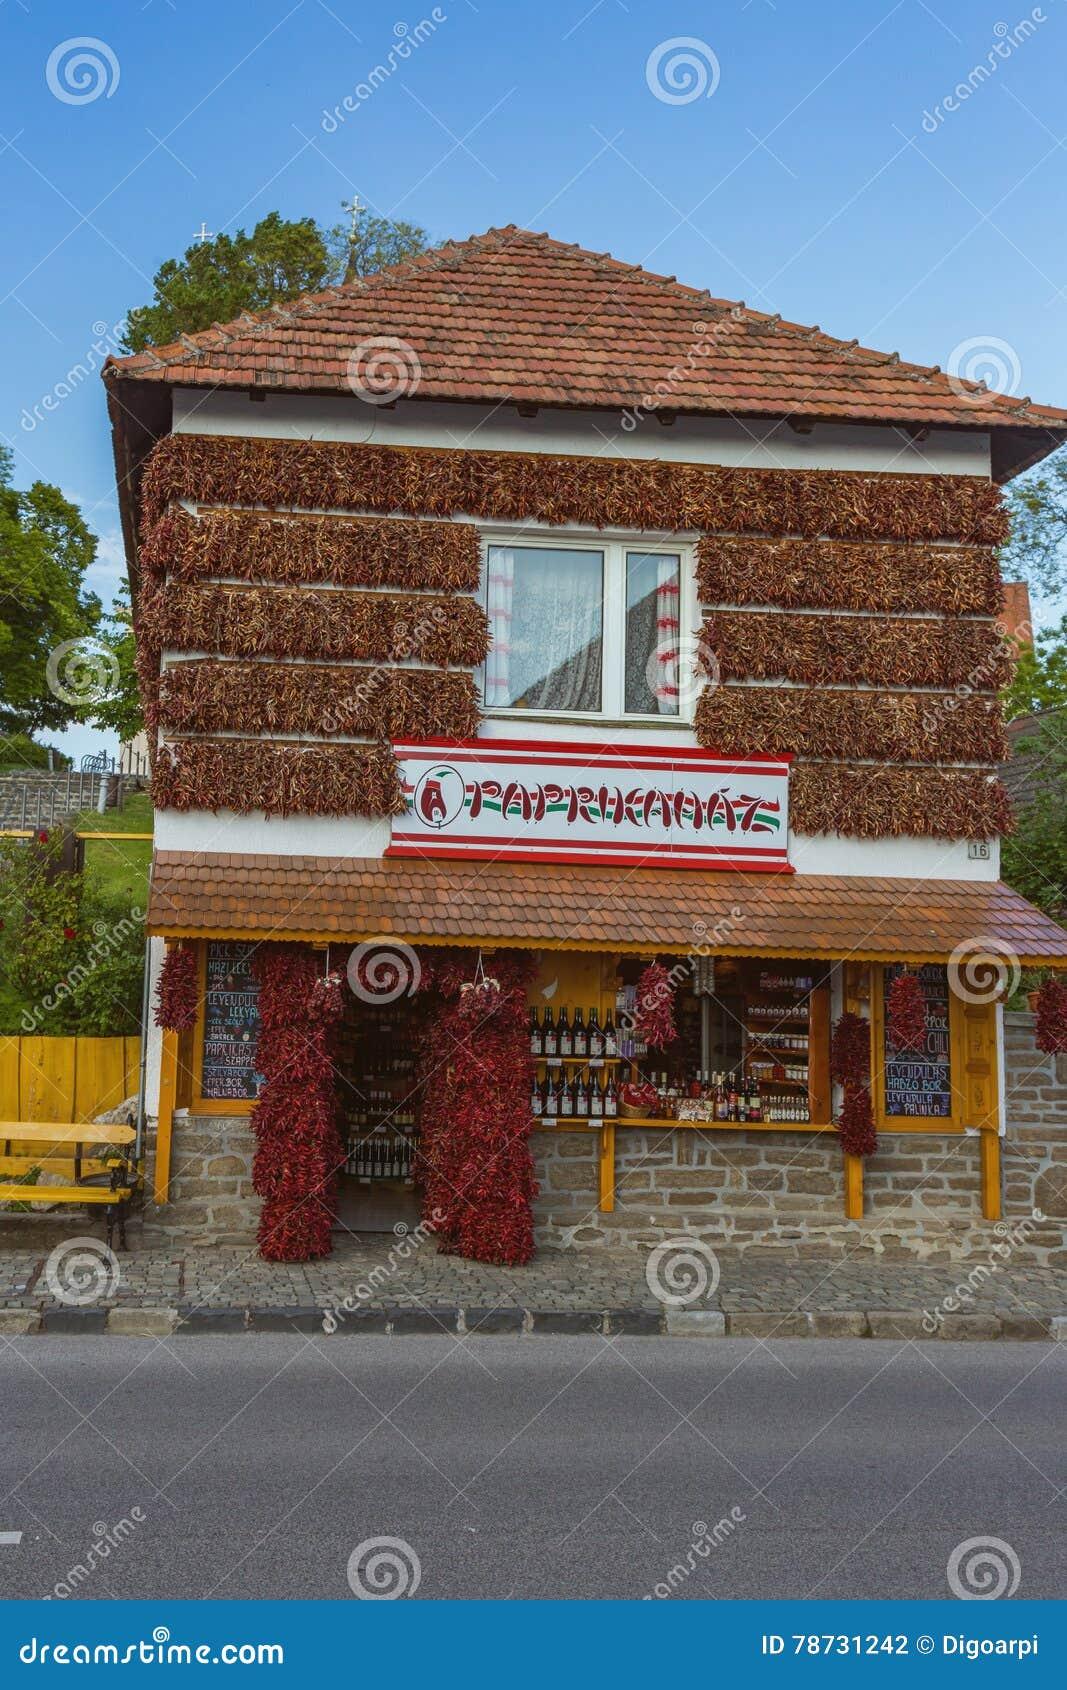 Turisten shoppar, namngett Paprikahaz i Tihany